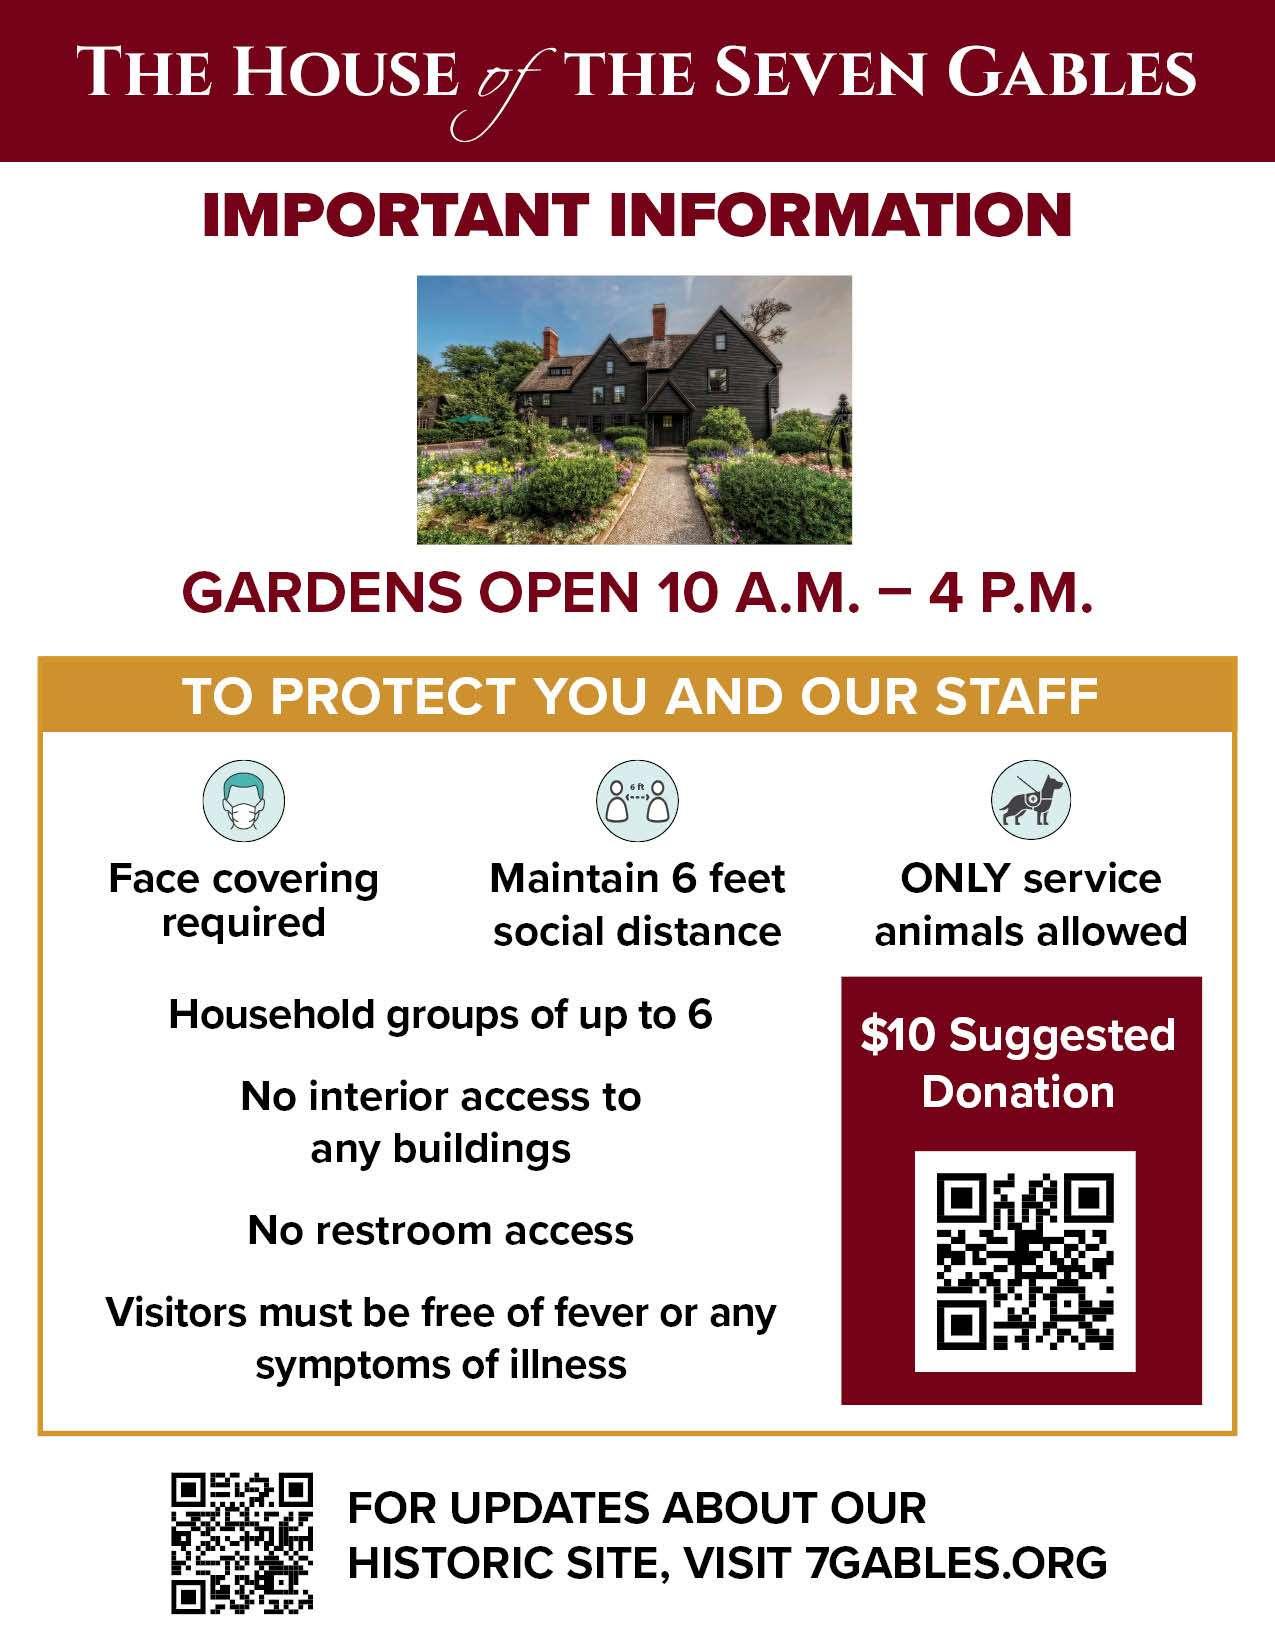 June 1 Reopening Gardens Information